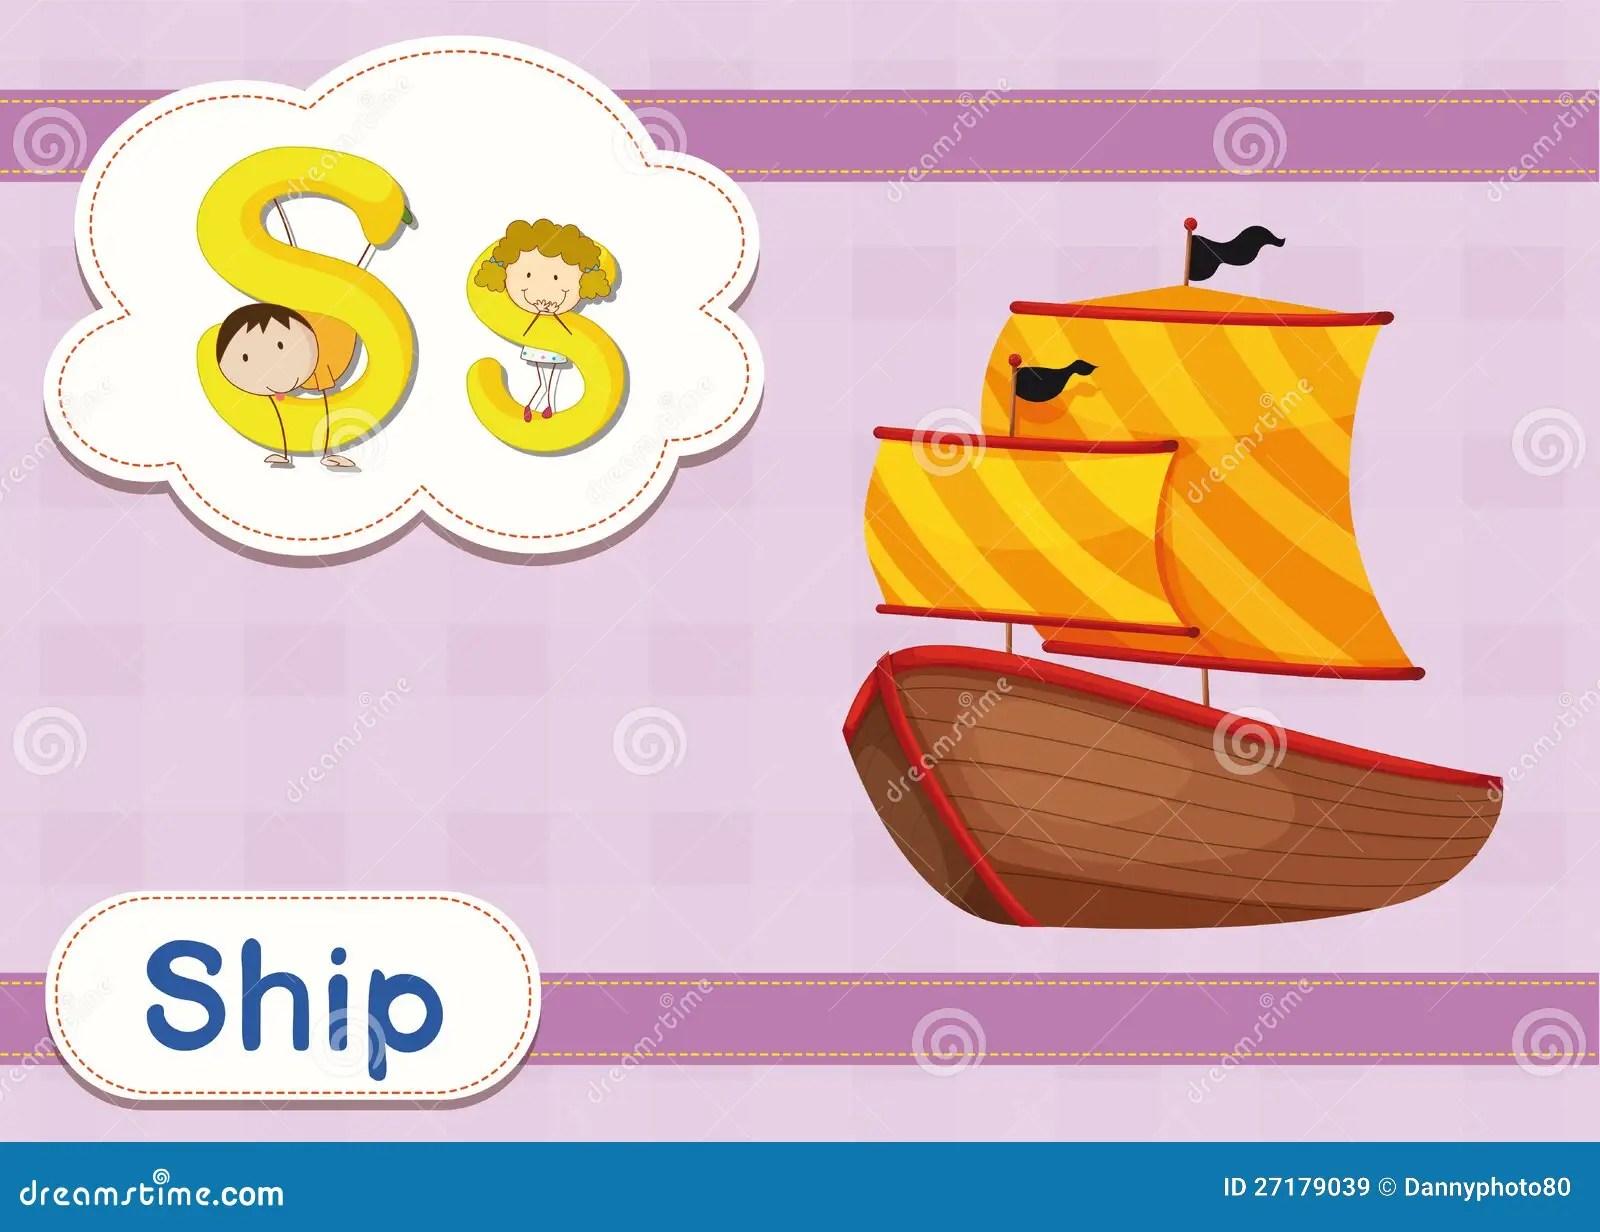 Vocabulary Worksheet Stock Illustration Illustration Of